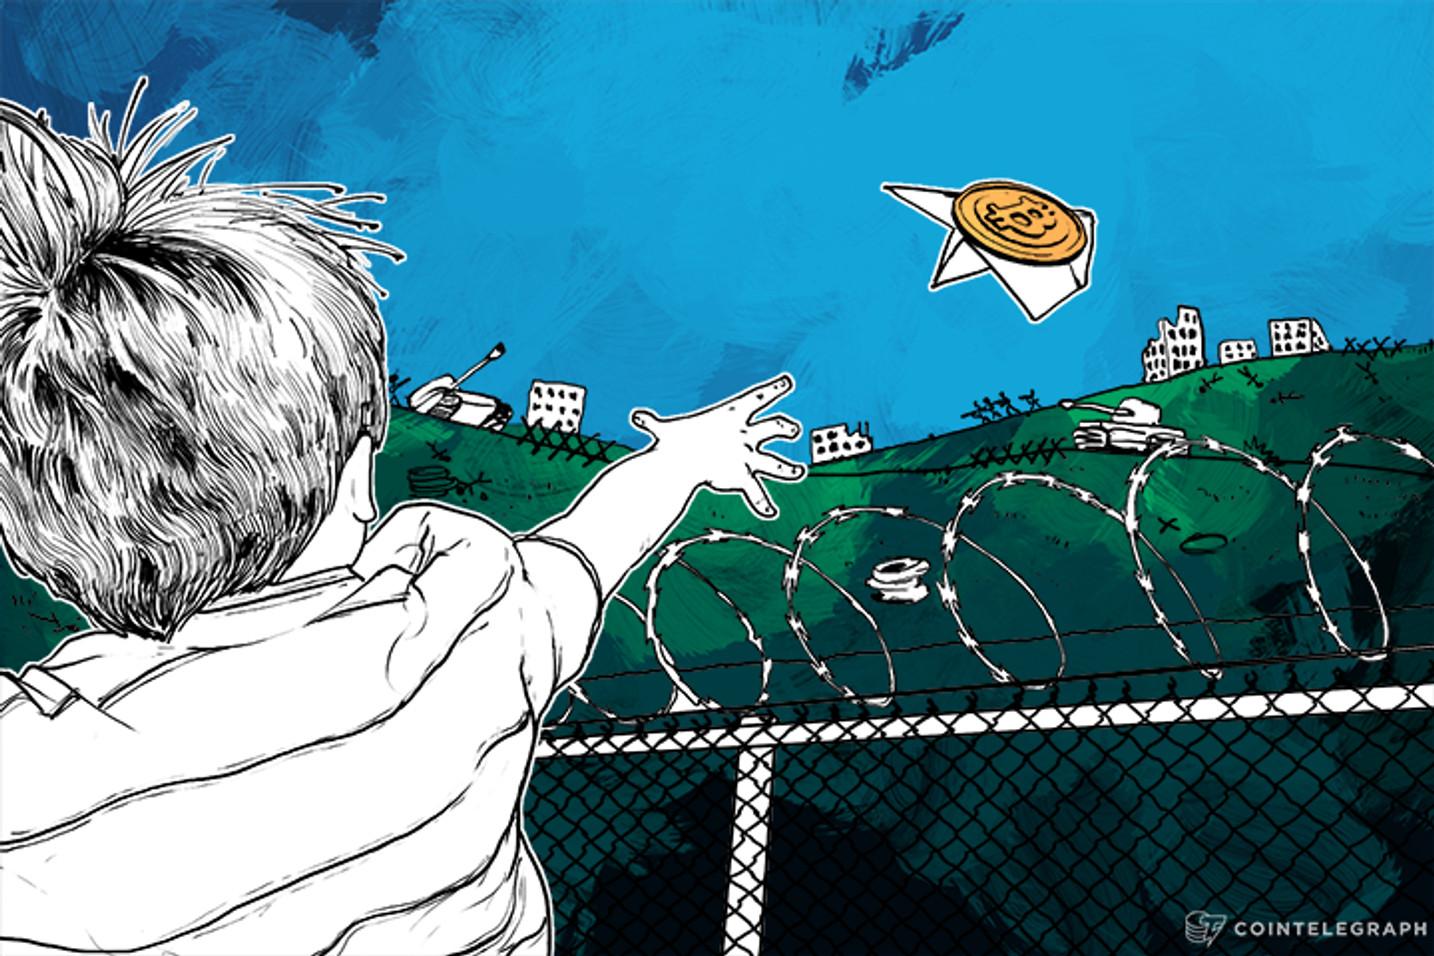 Kiev's Economic Blockade Boosts Bitcoin Usage in Separatist East